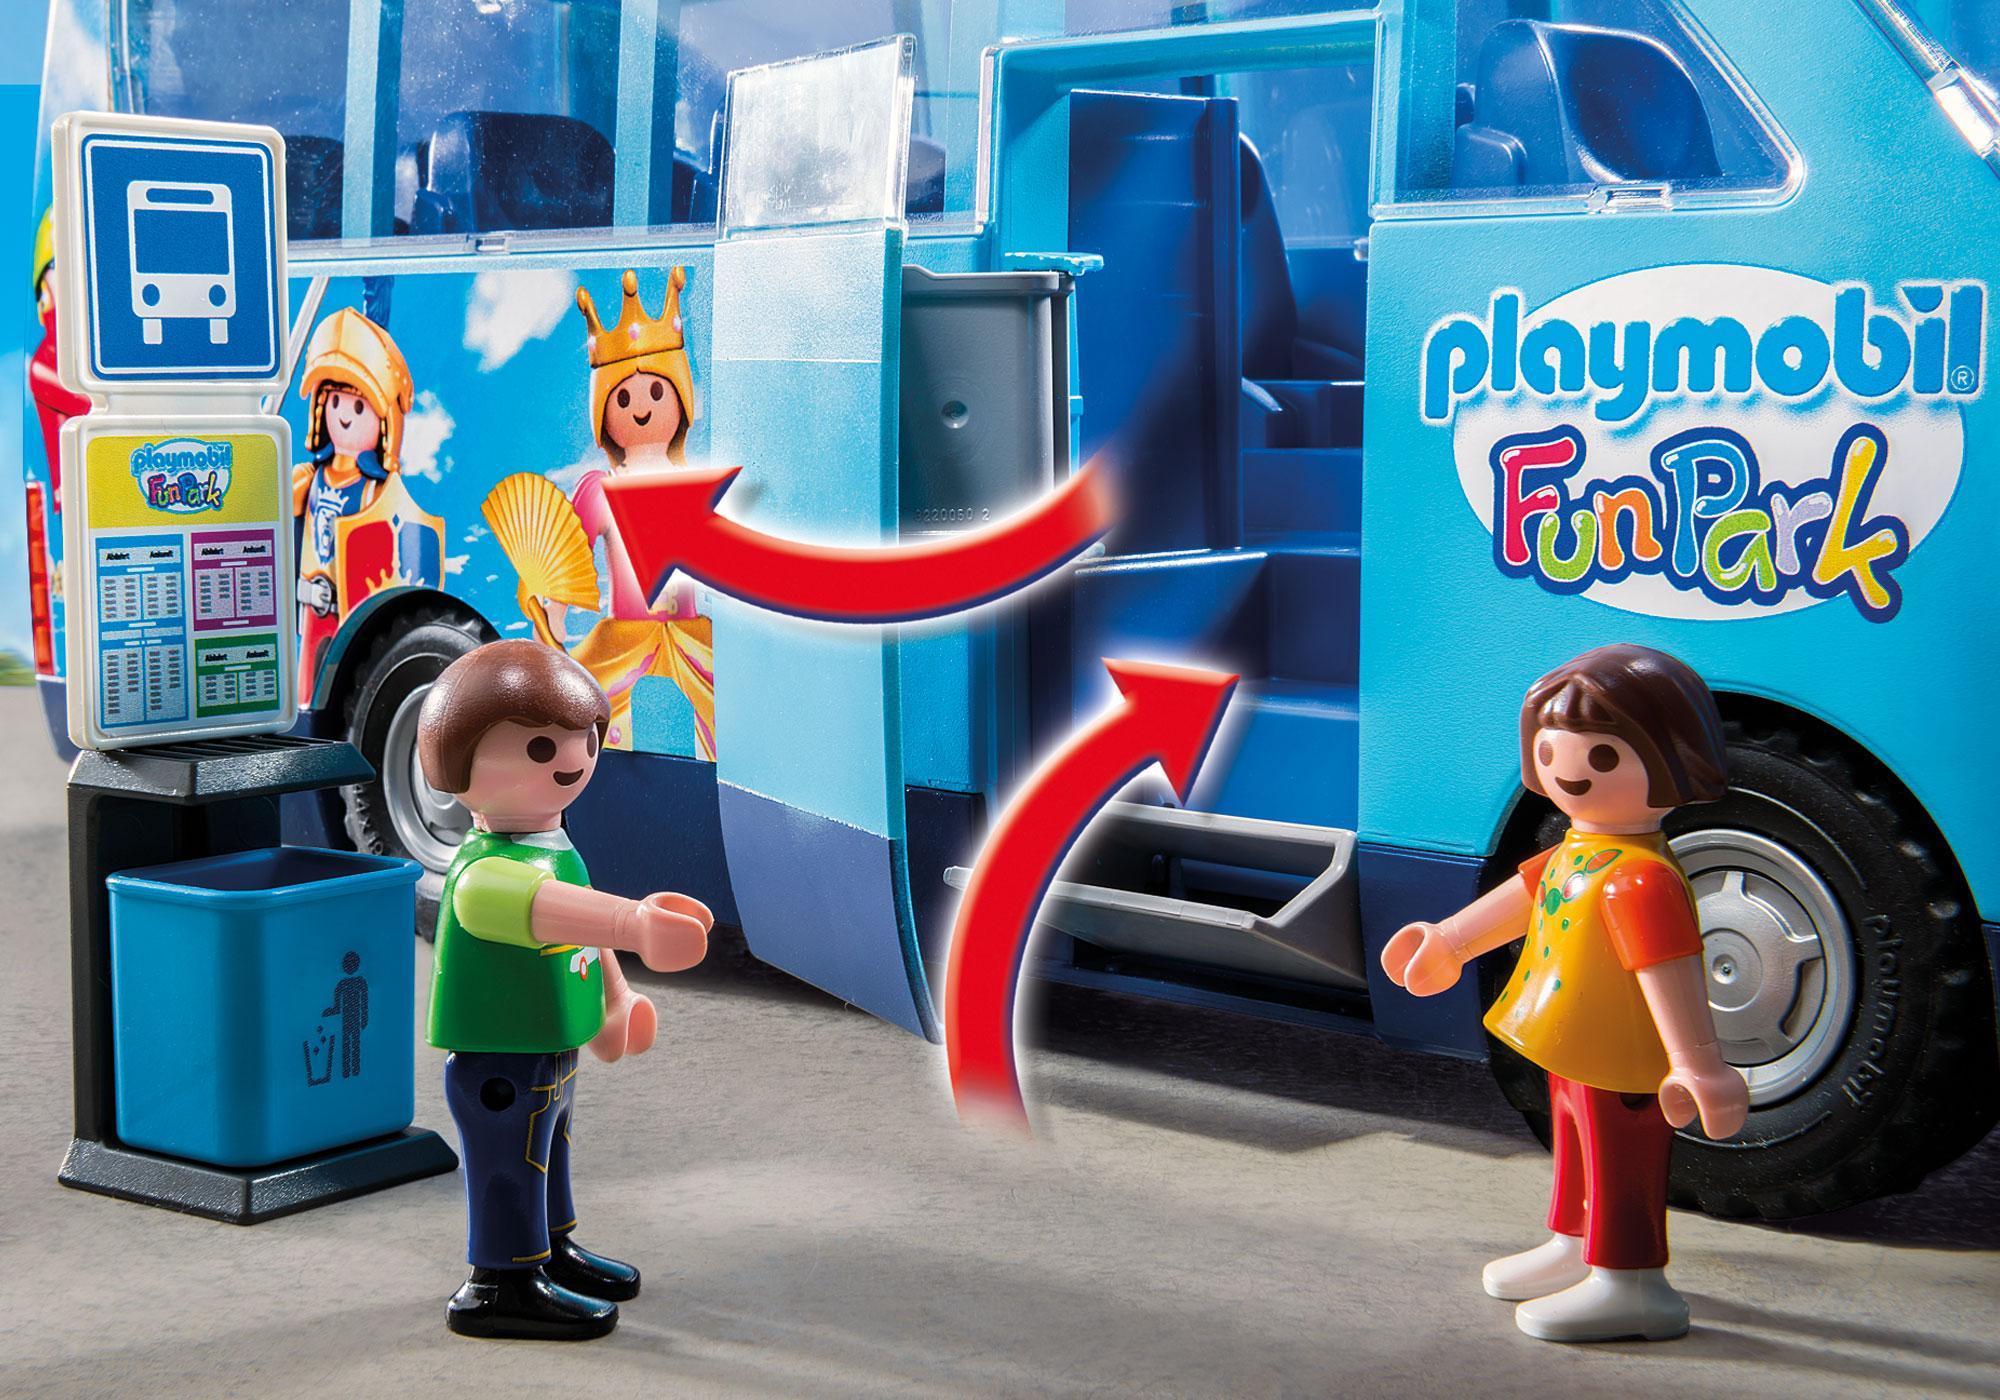 http://media.playmobil.com/i/playmobil/9117_product_extra1